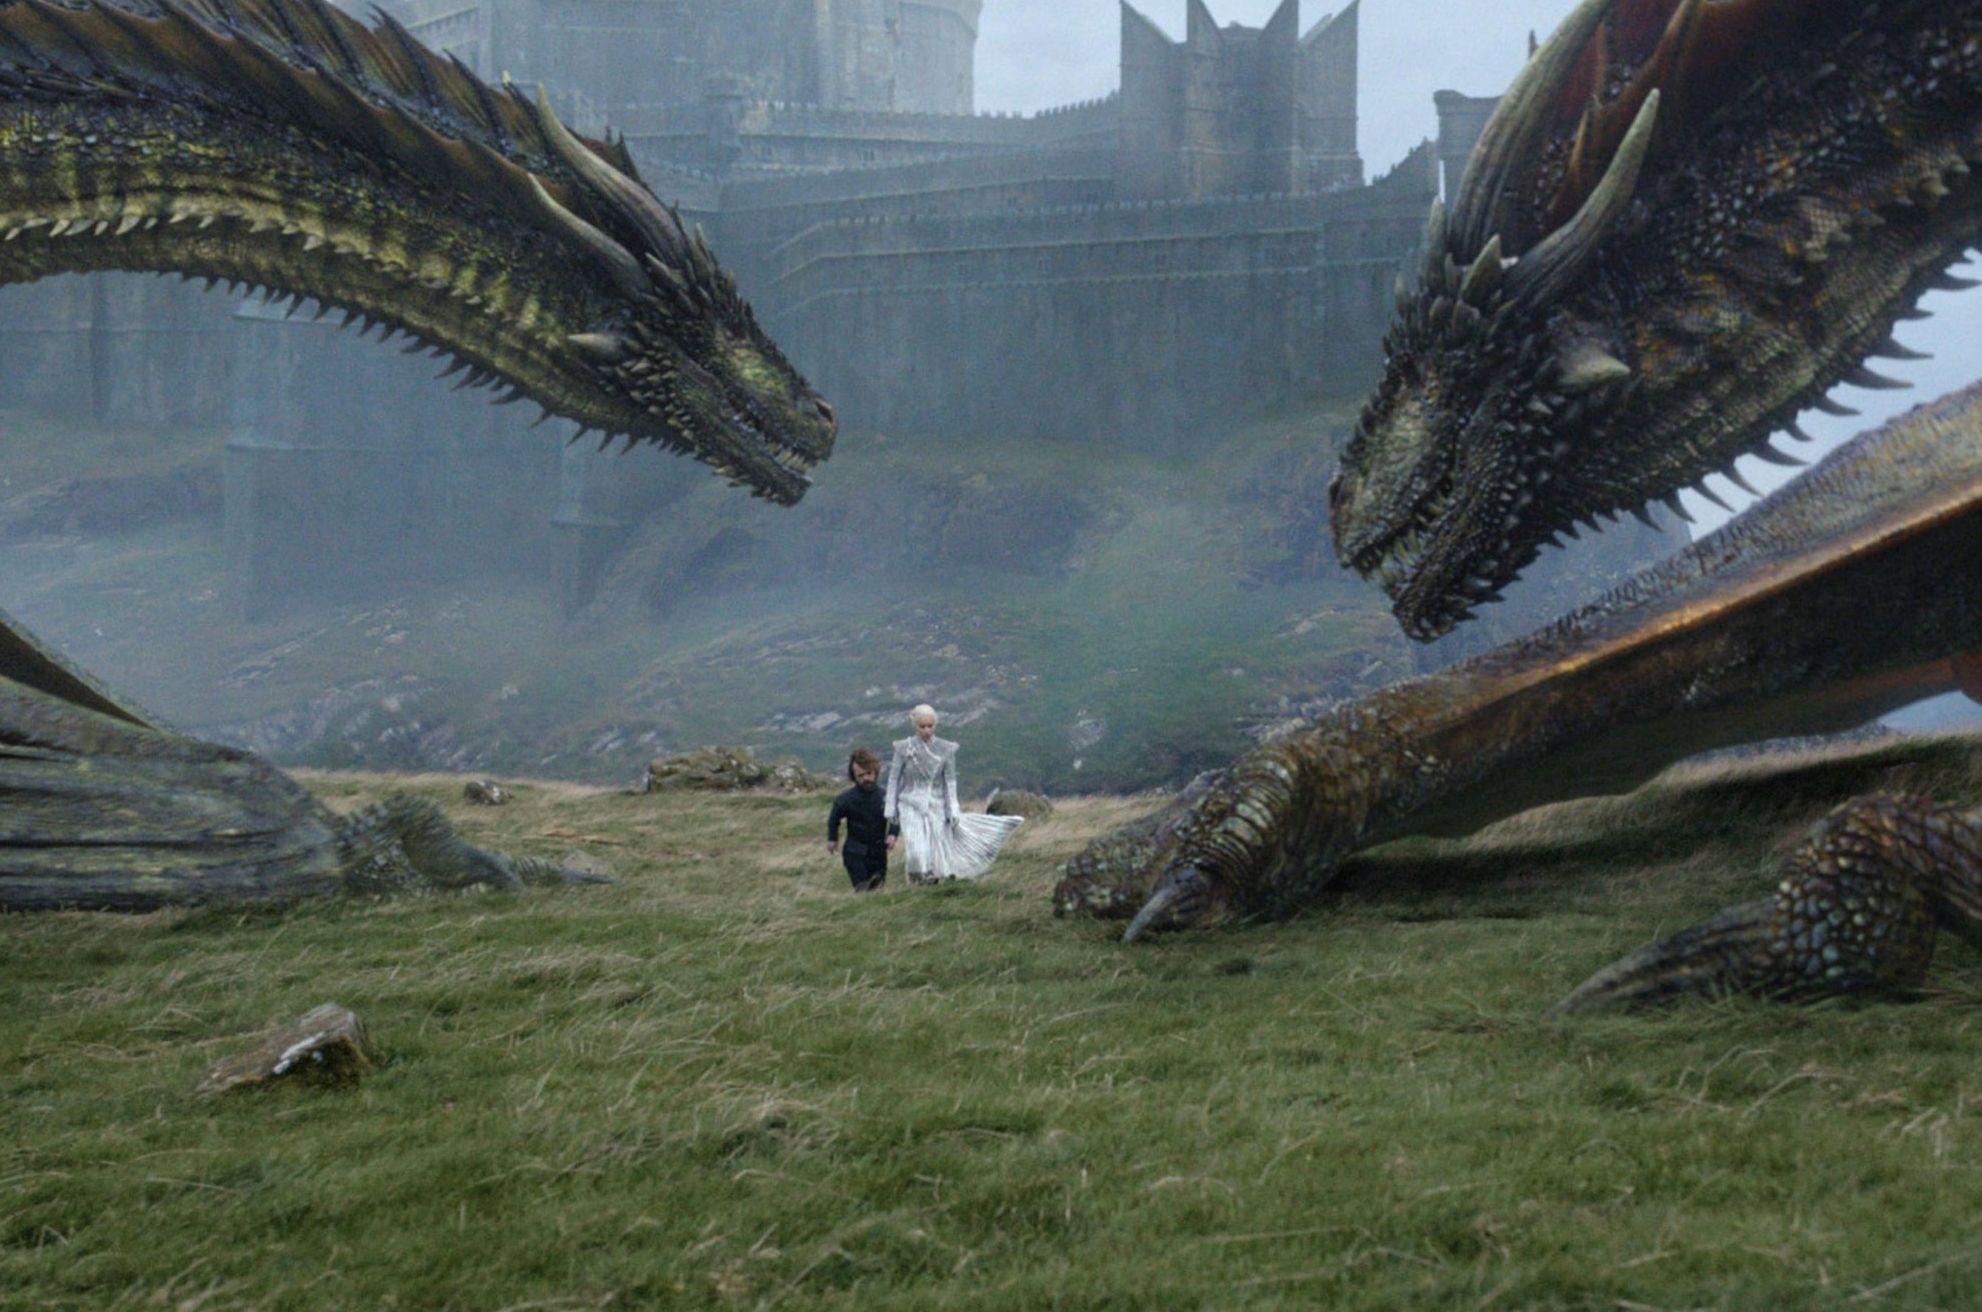 Danny and Tyrion among her dragons